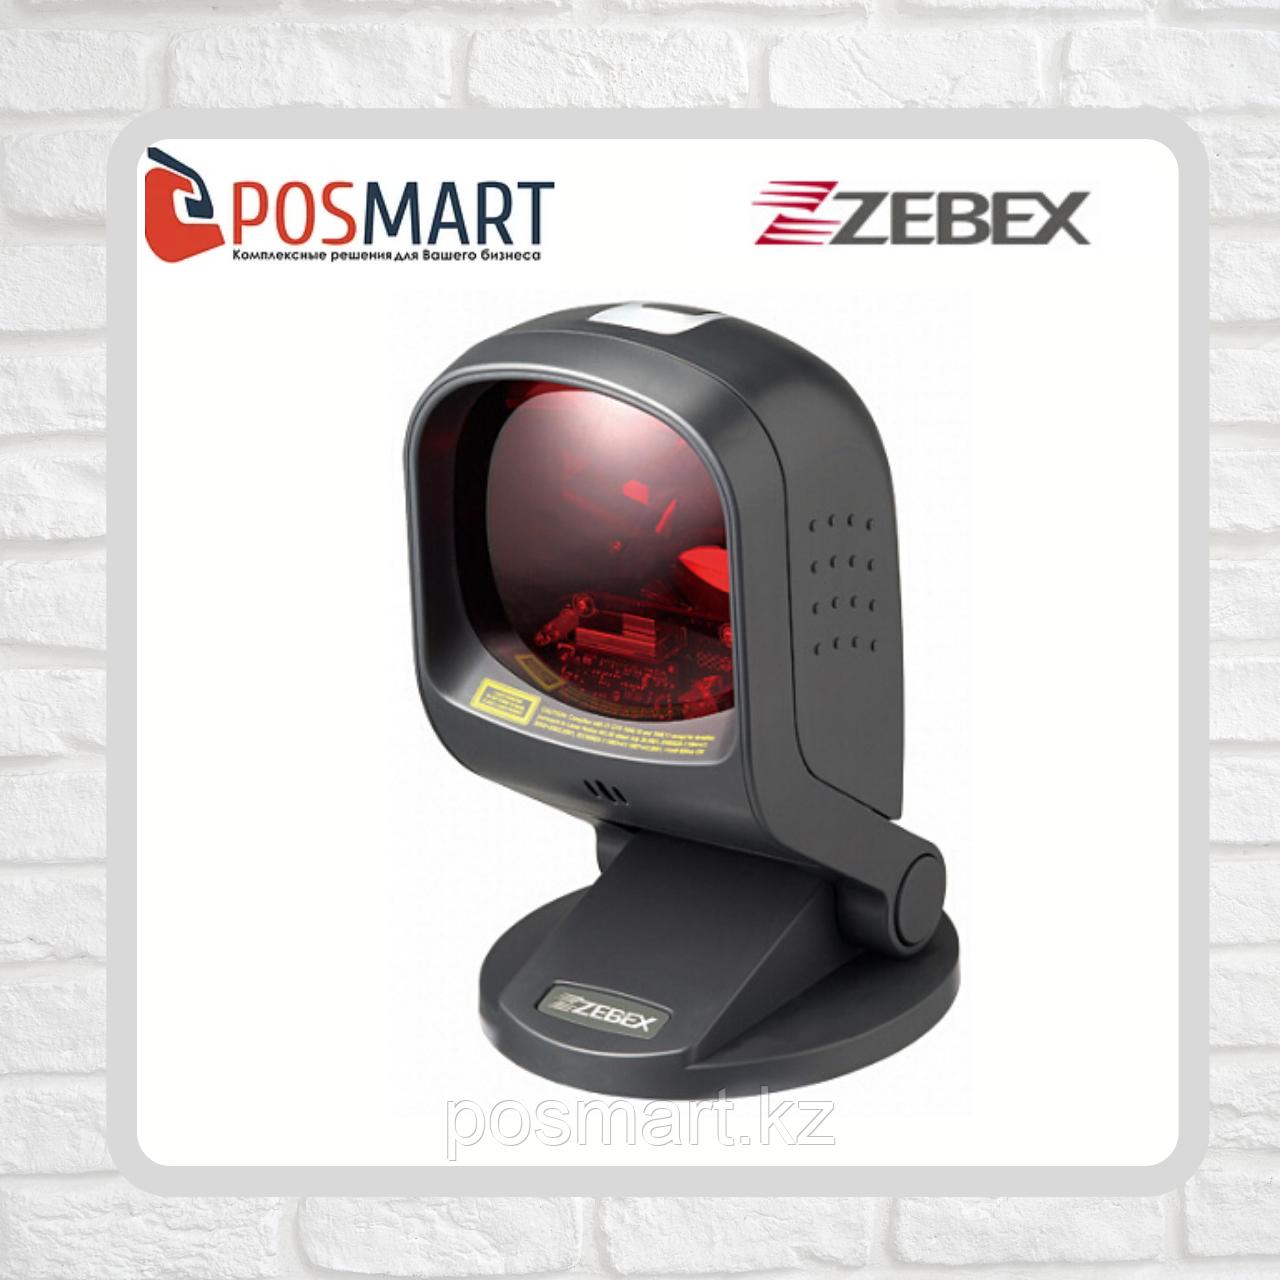 Стационарный сканер штрихкода Zebex Z-6170